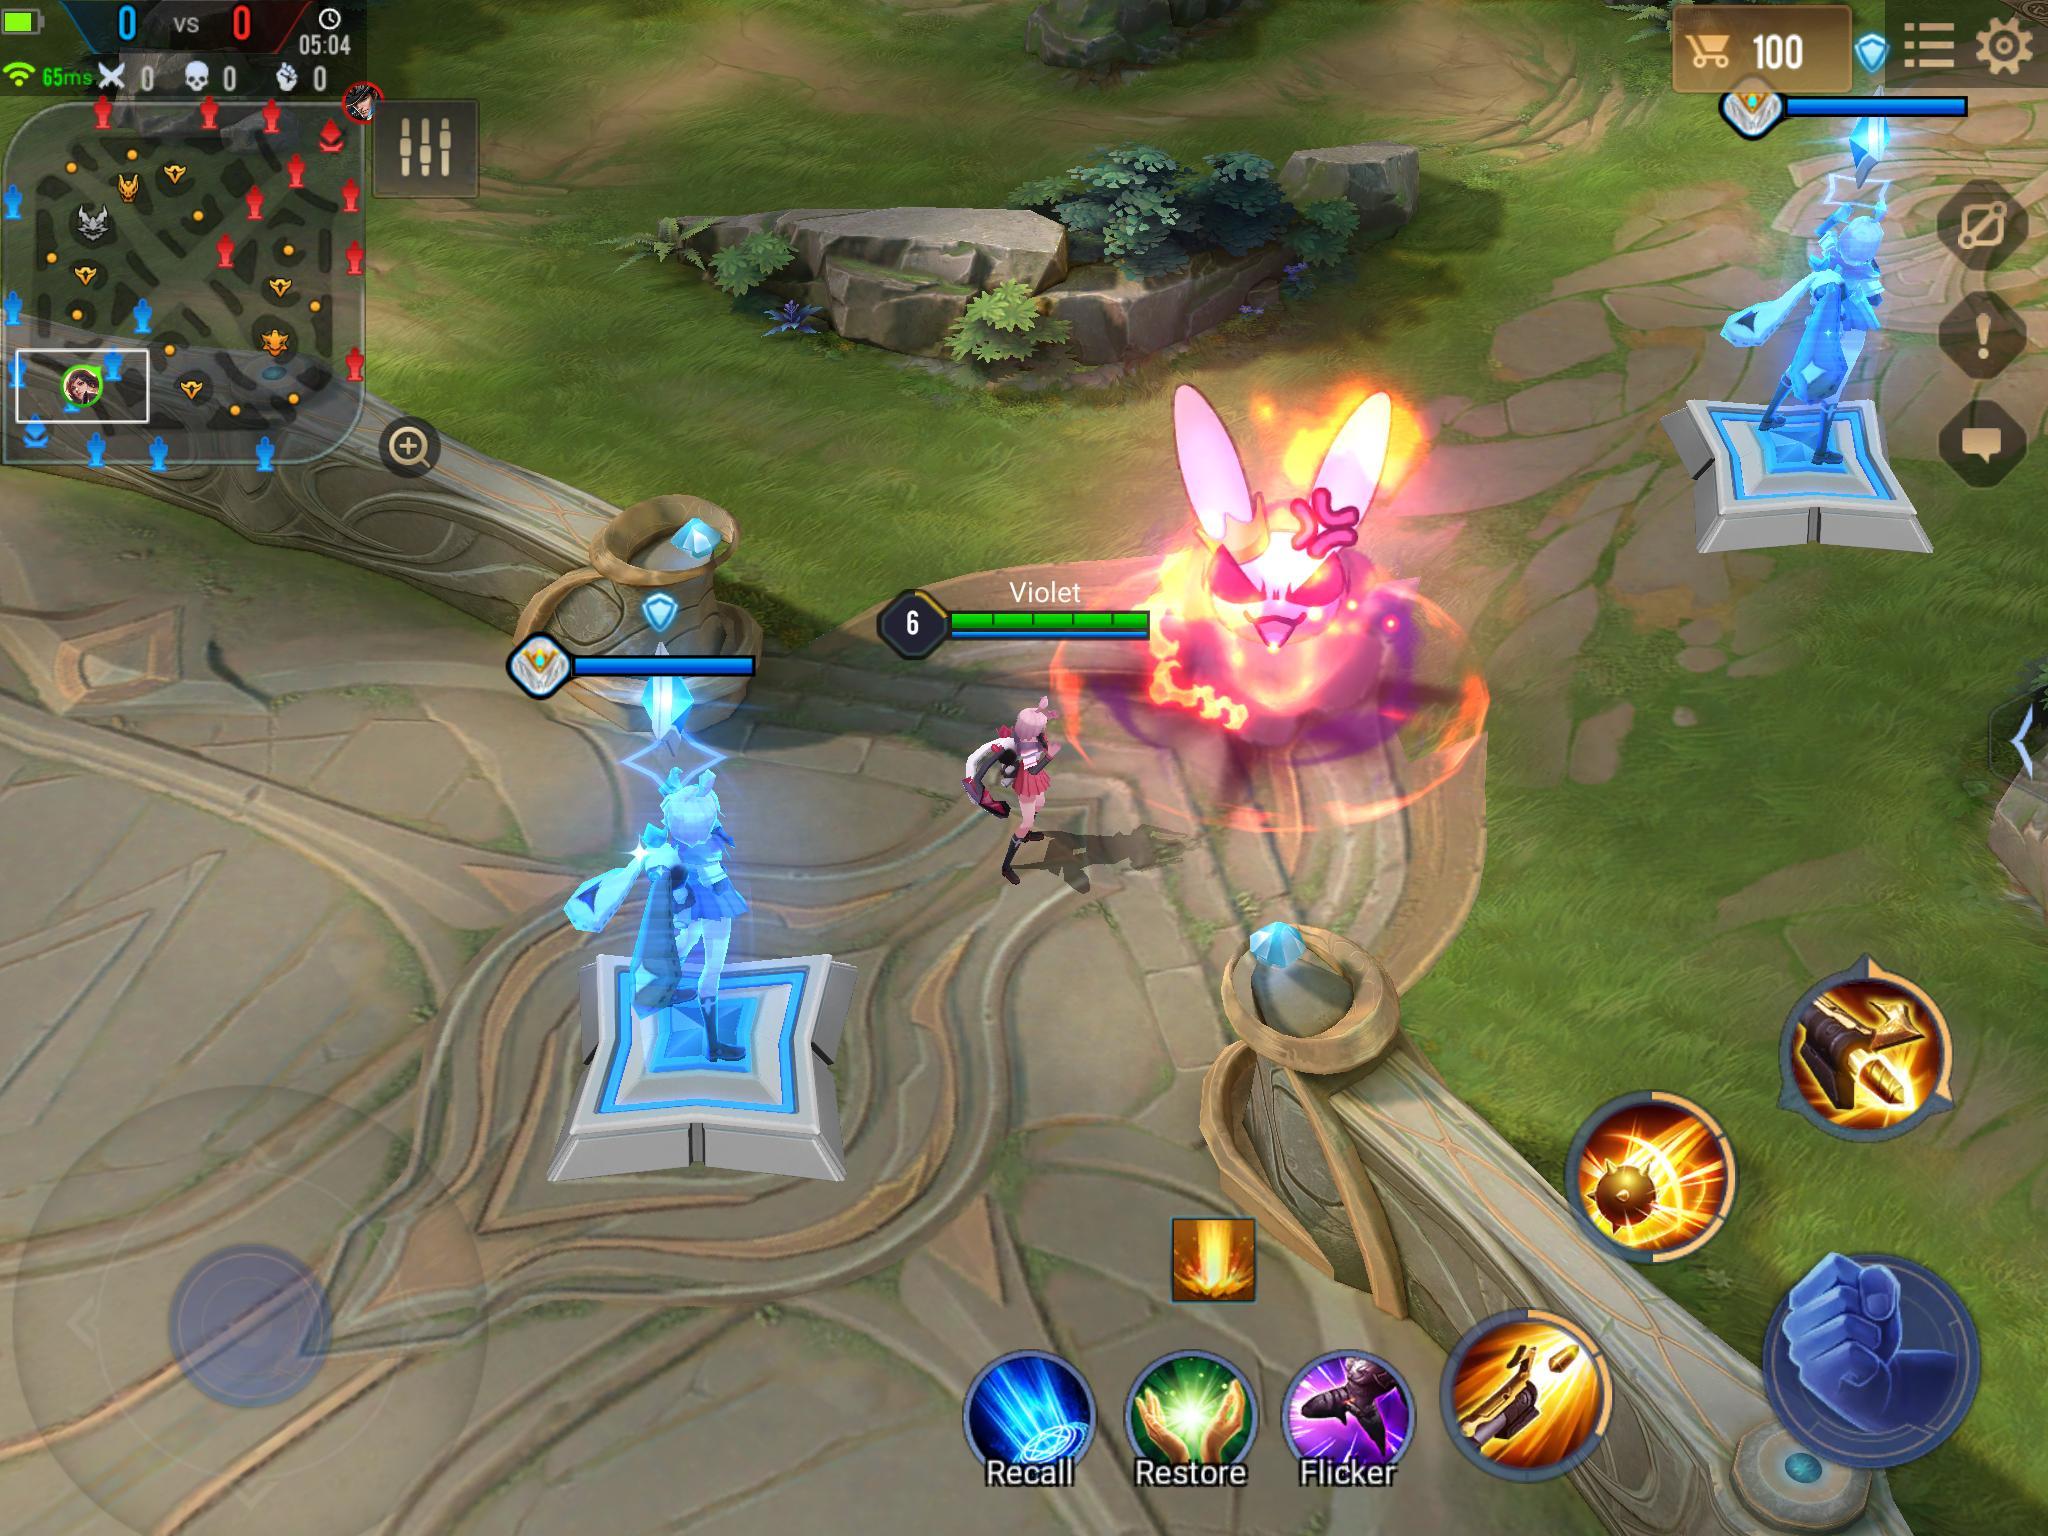 Garena AOV - Arena of Valor: Action MOBA 1.36.1.5 Screenshot 23